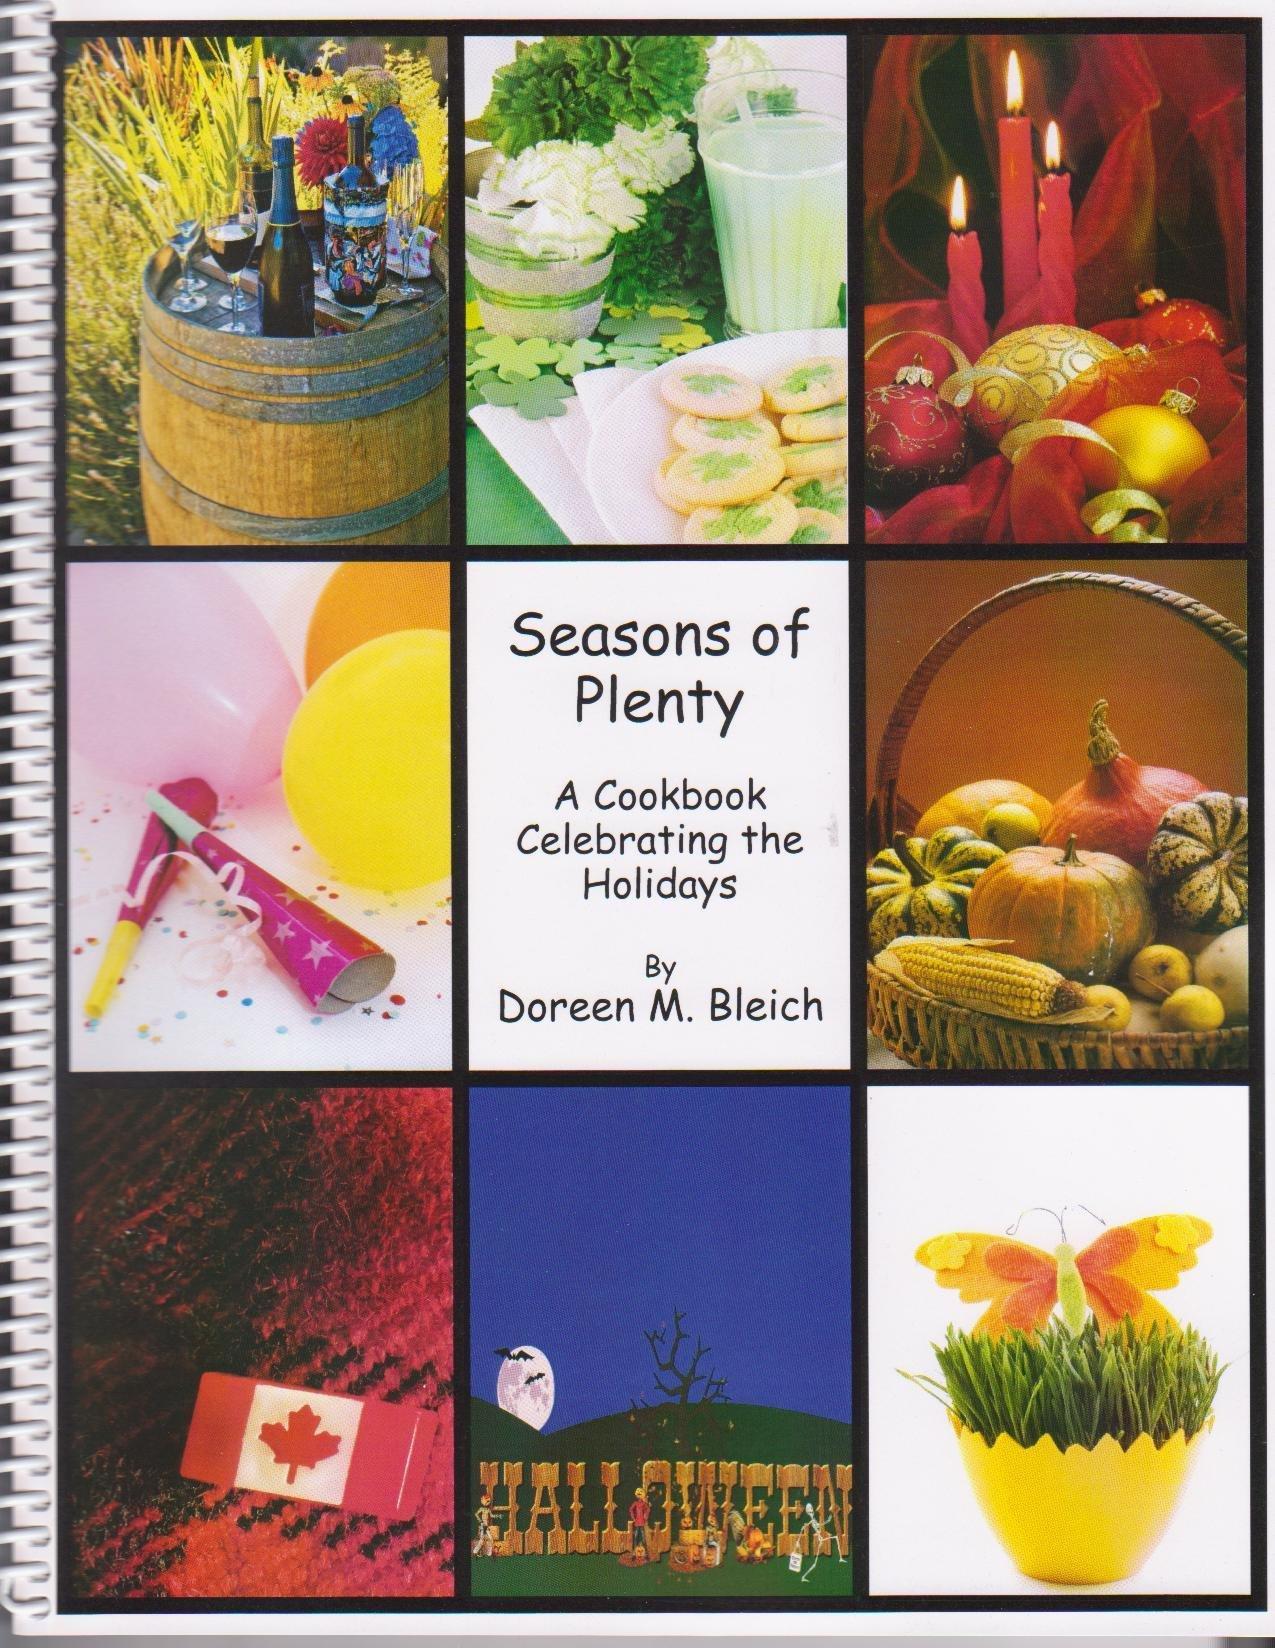 Seasons of Plenty: A Cookbook Celebrating the Holidays 00001251